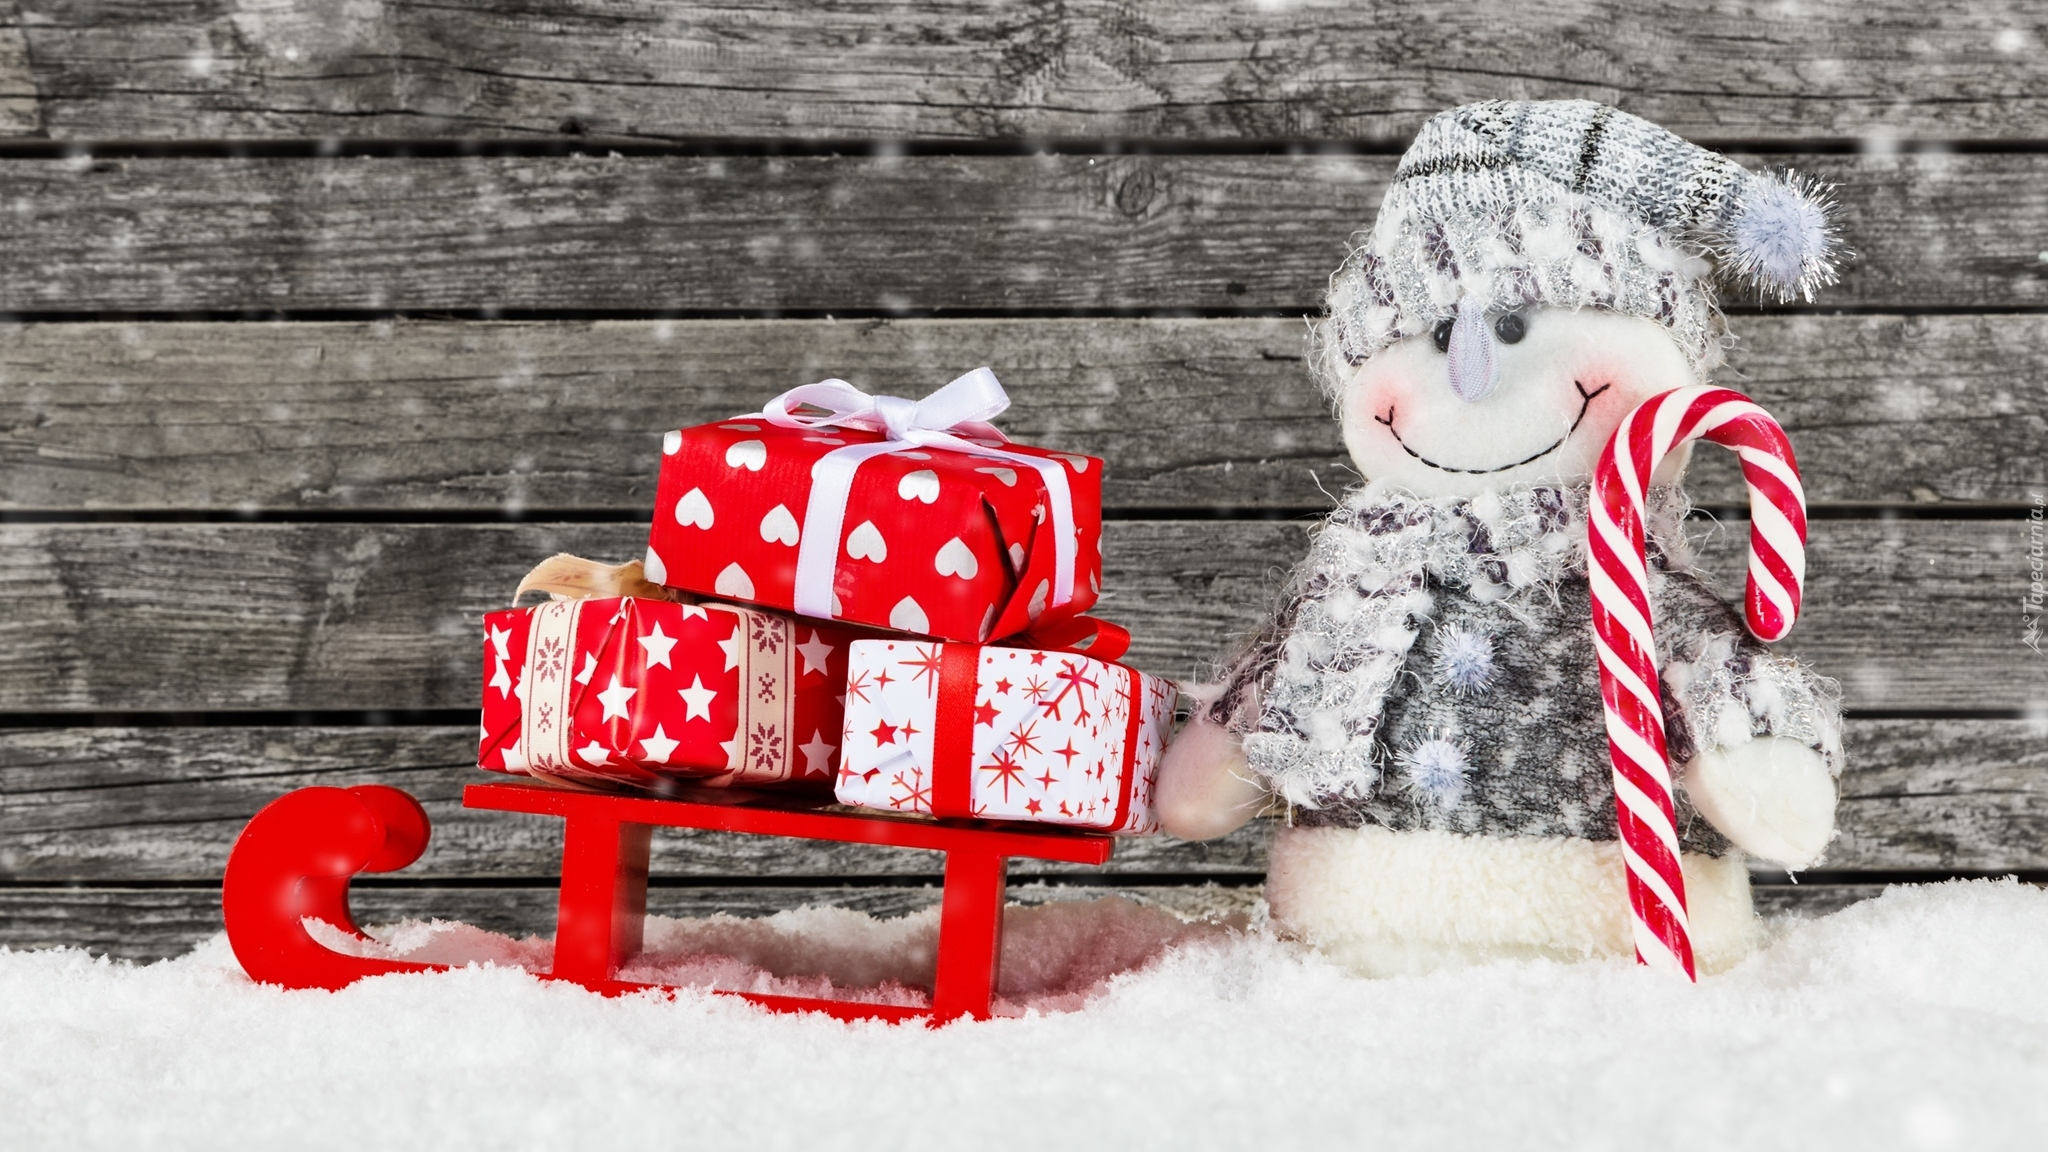 подарки снег gifts snow без регистрации